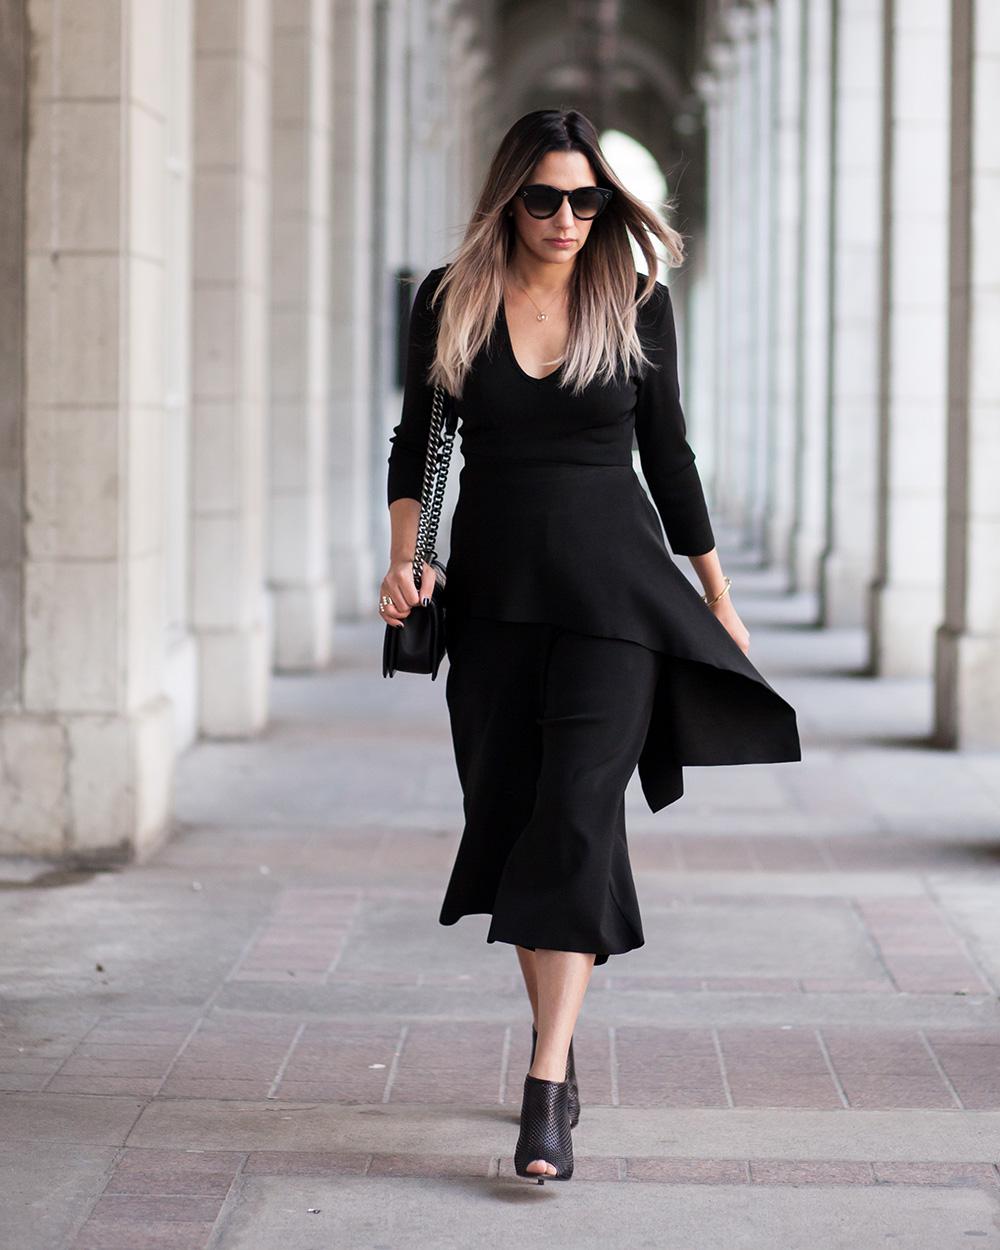 Grey Canvas, Mejuri, Quinsco, Zara, Assymetrical, Elegant Chic